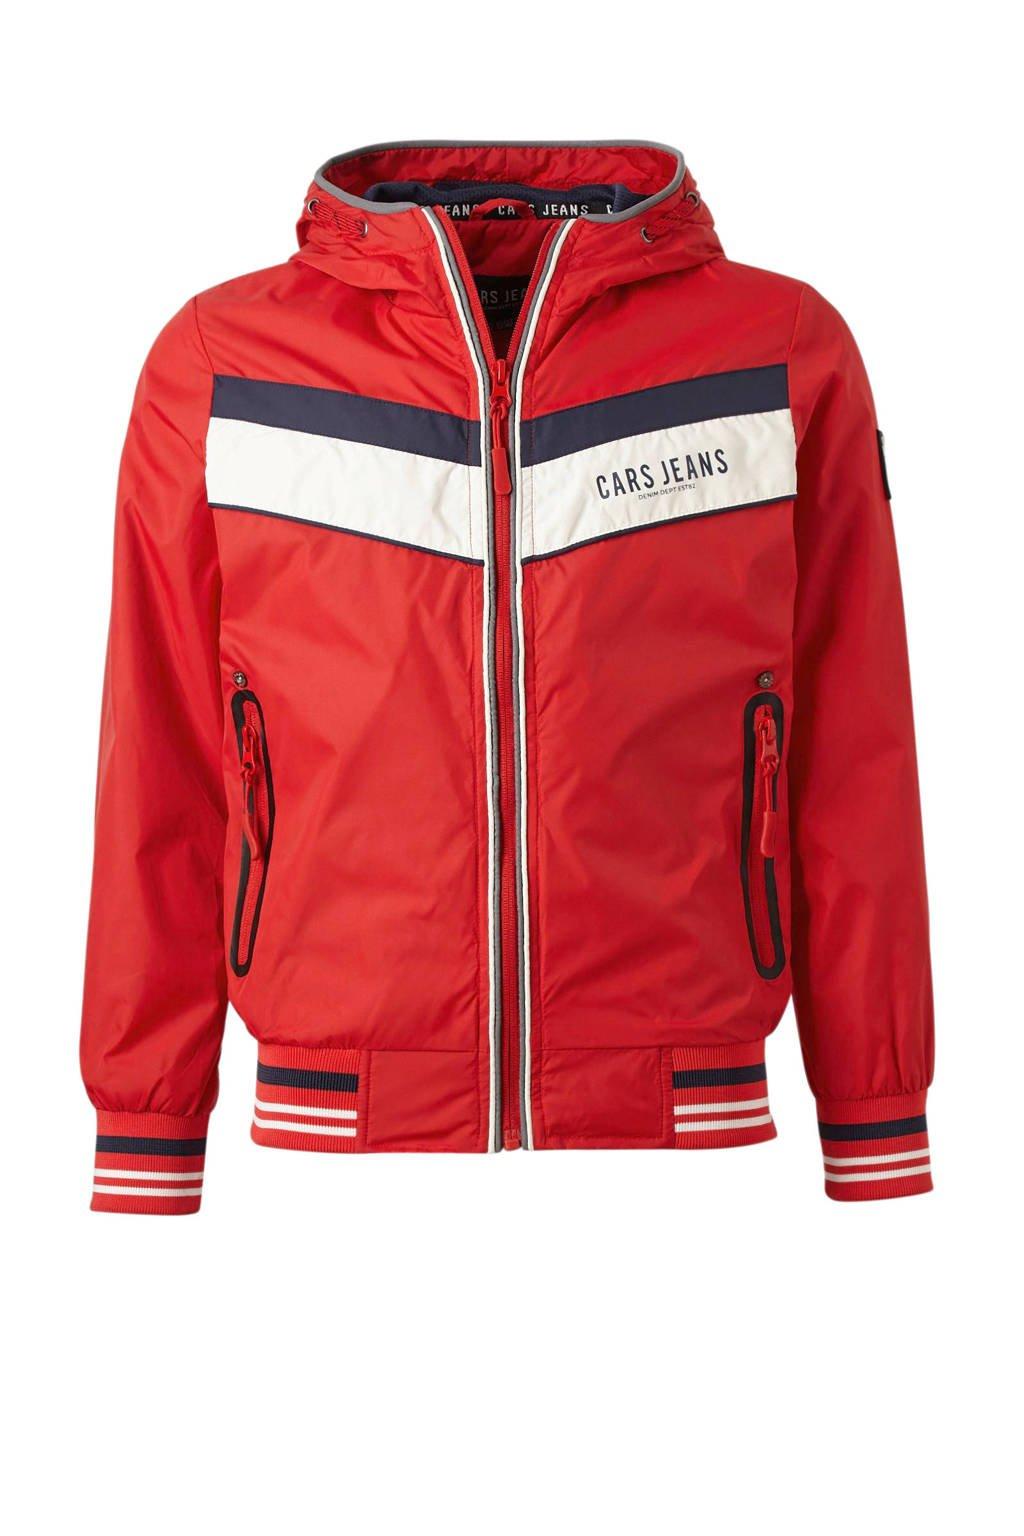 Cars zomerjas met capuchon Alzono rood, Rood